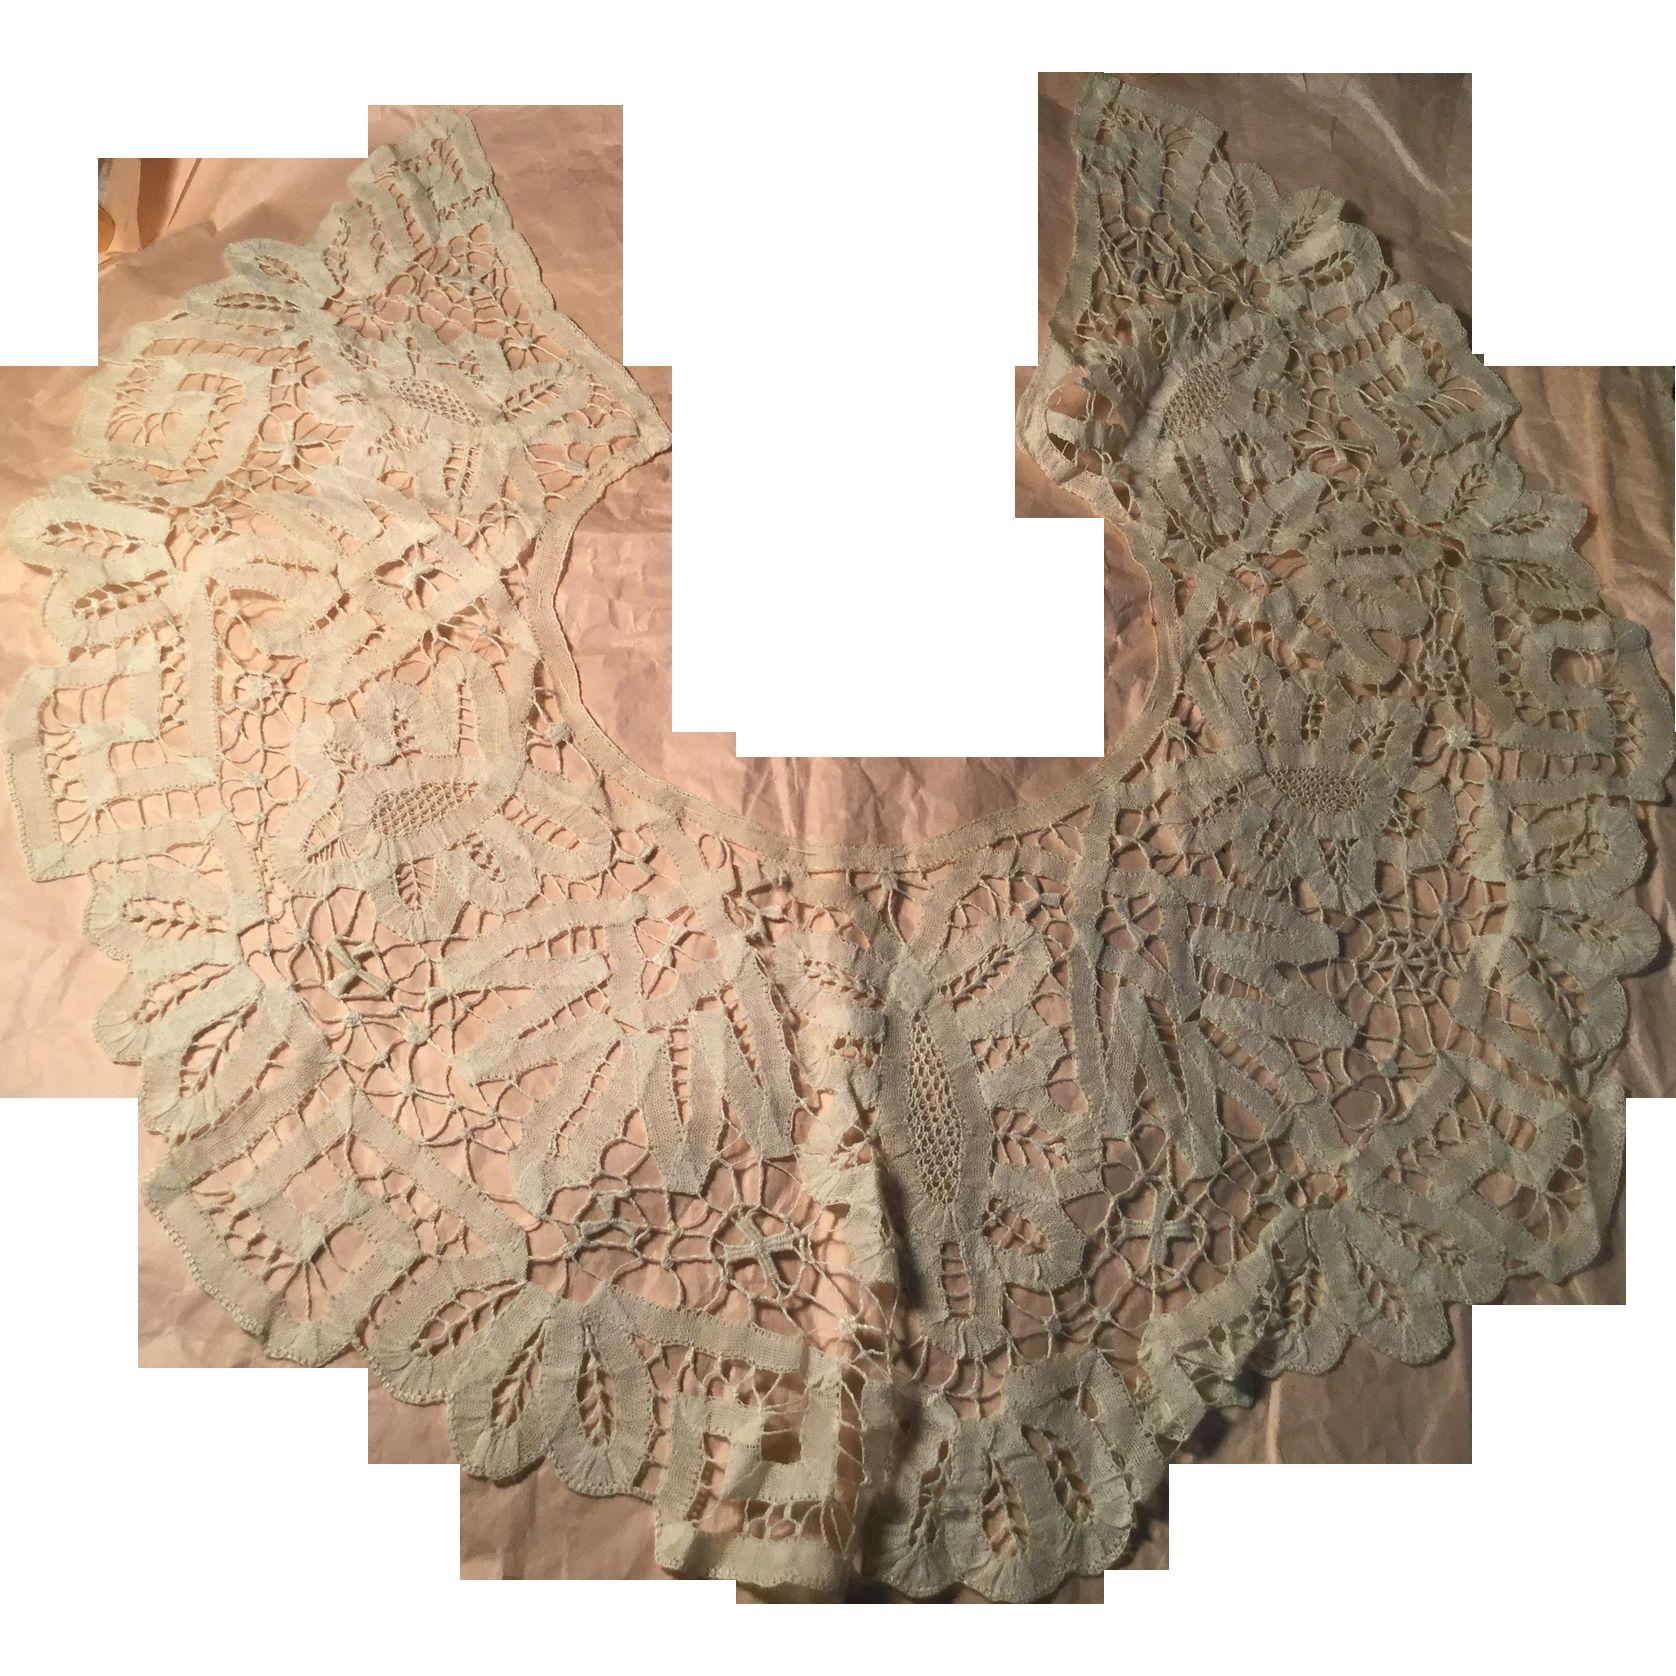 C.1900 Beautifully Handmade Lace Collar